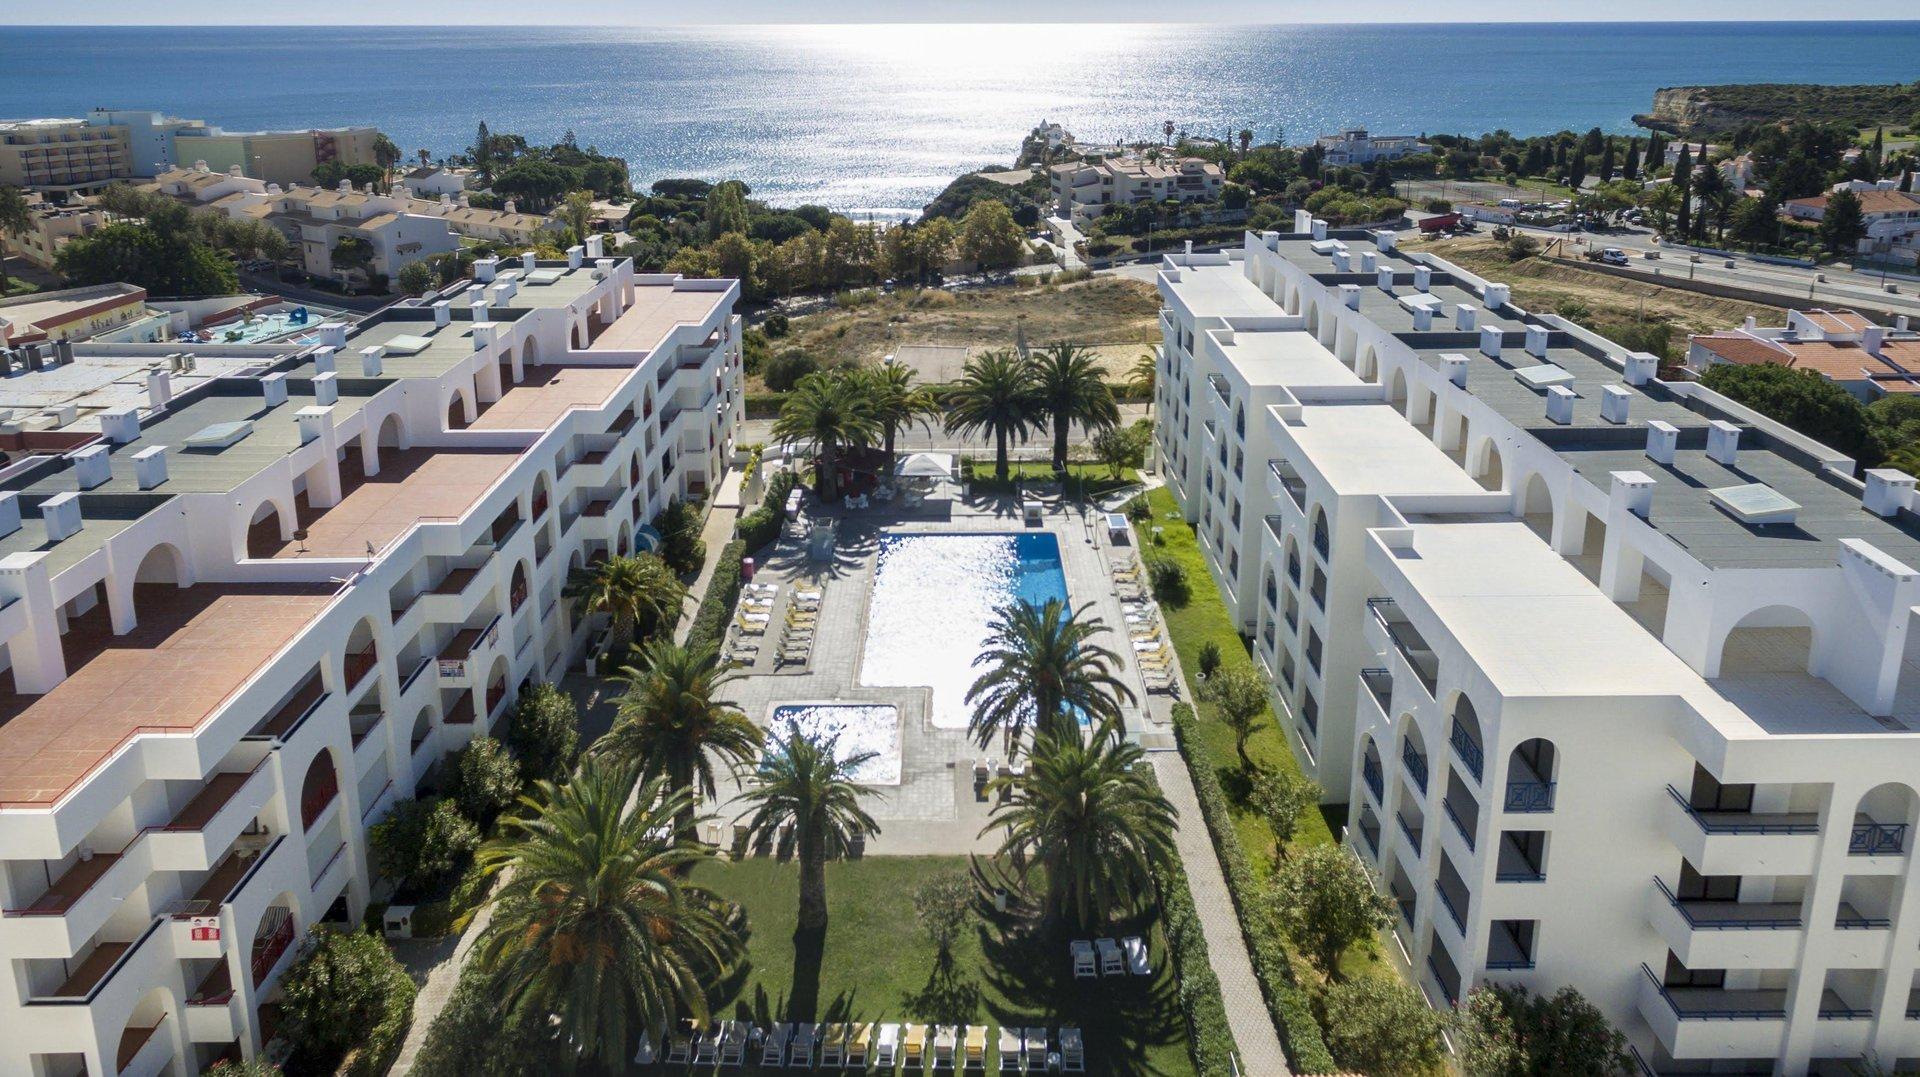 Appartementen Be Smart Terrace Algarve - Armaçao de Pera